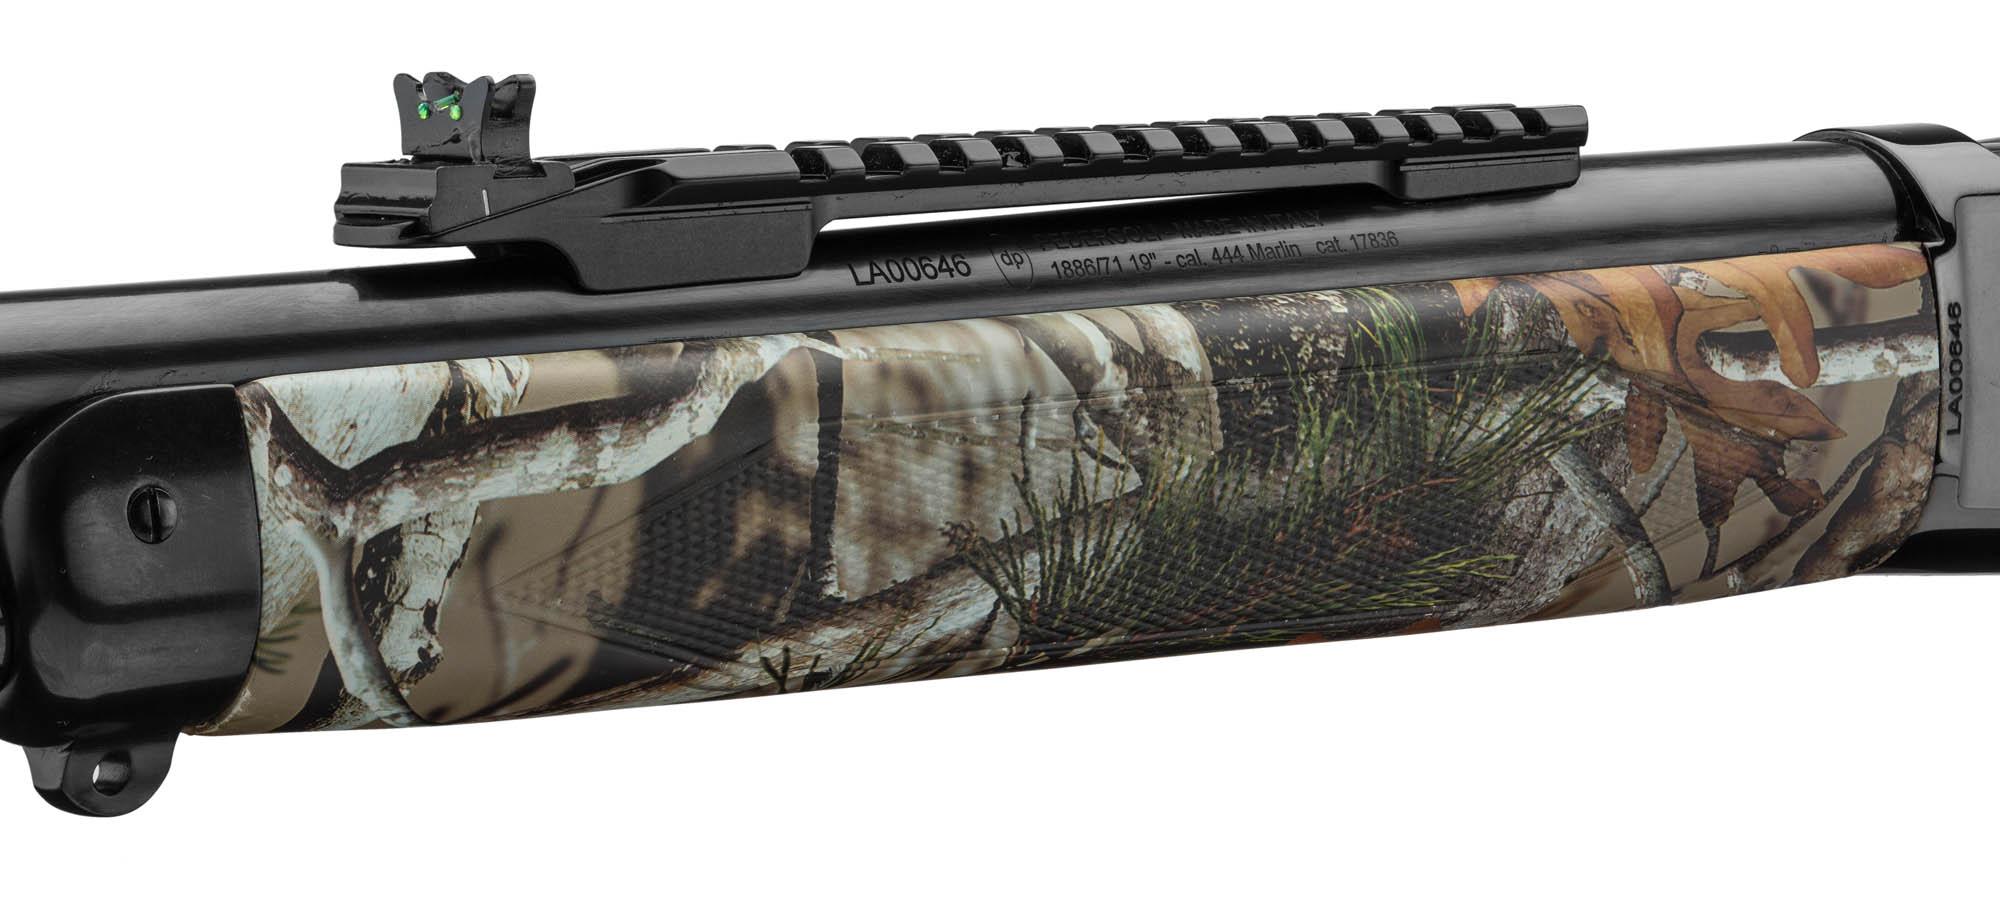 Pedersoli rifle lift action mod  86/71 cal  444 Marlin